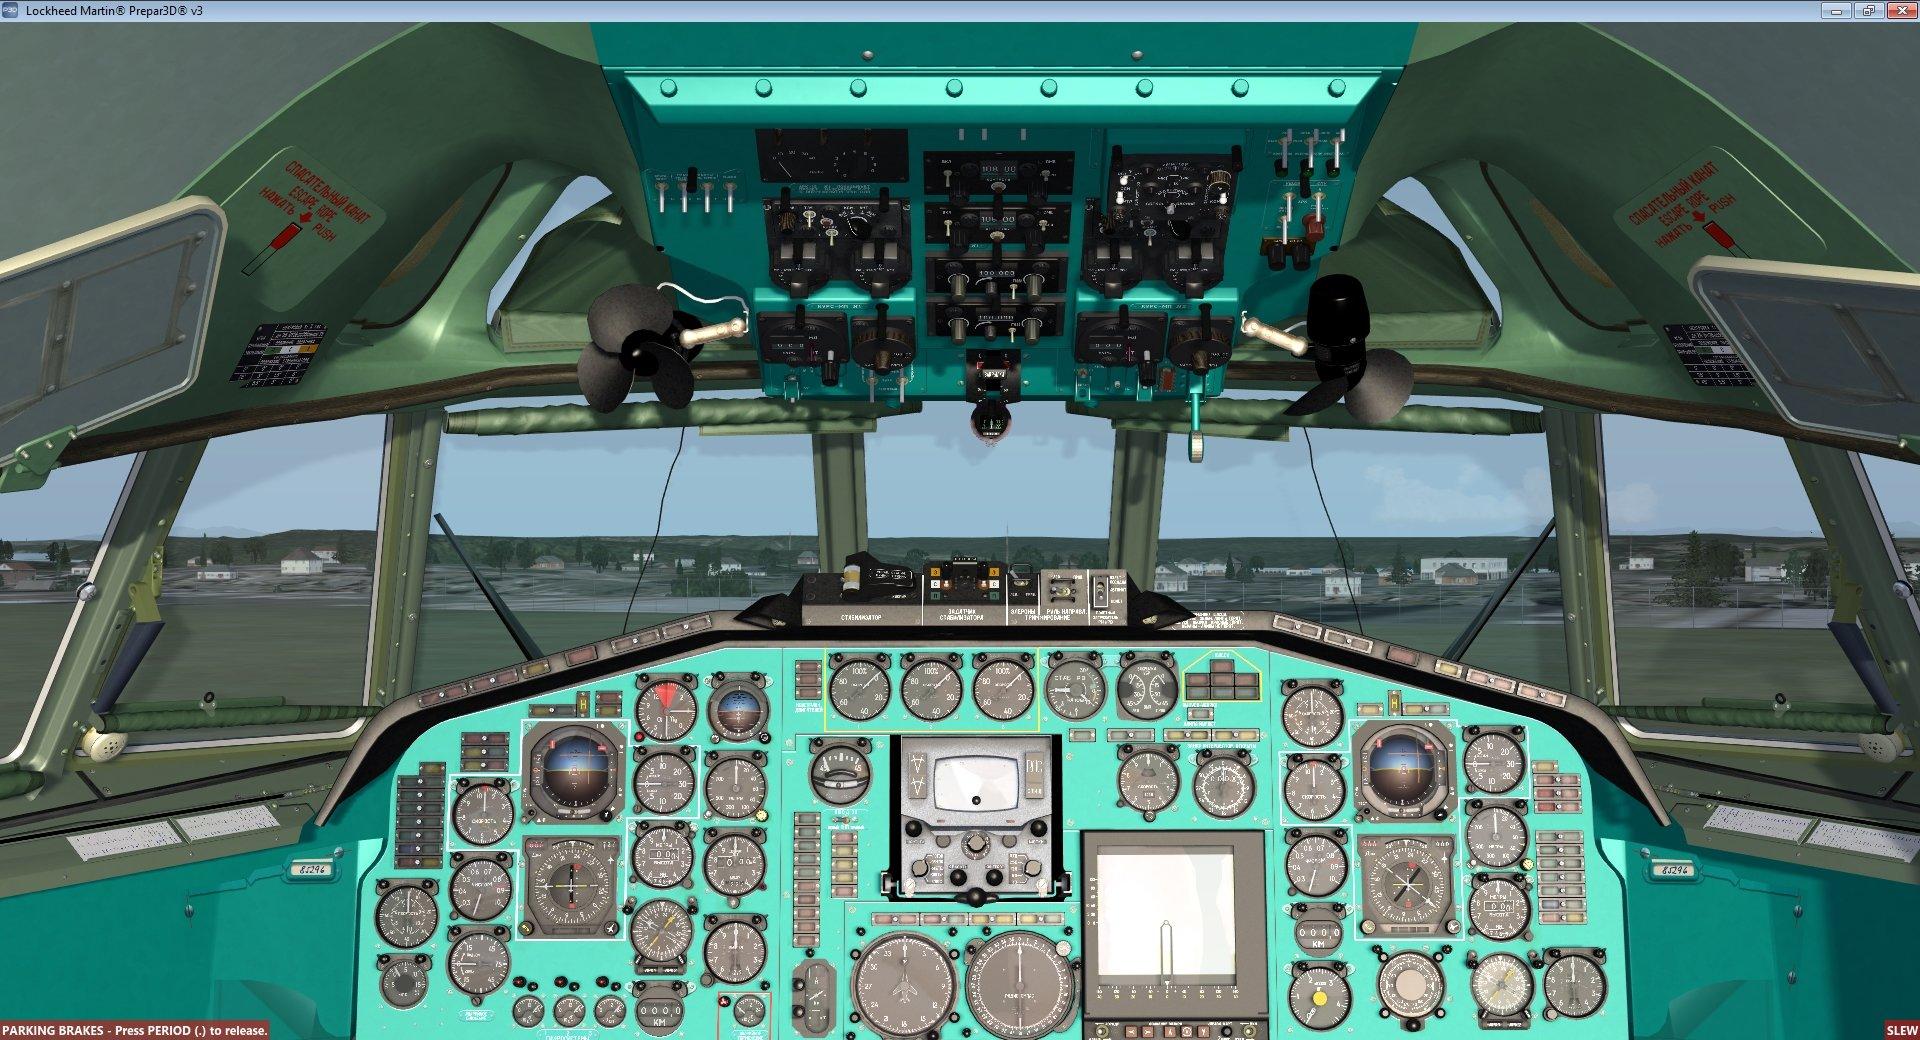 1512895329_2019-04-2002_18_24-LockheedMartinPrepar3Dv3.jpg.06dba81d888e2ab6aa373f4c8909019d.jpg